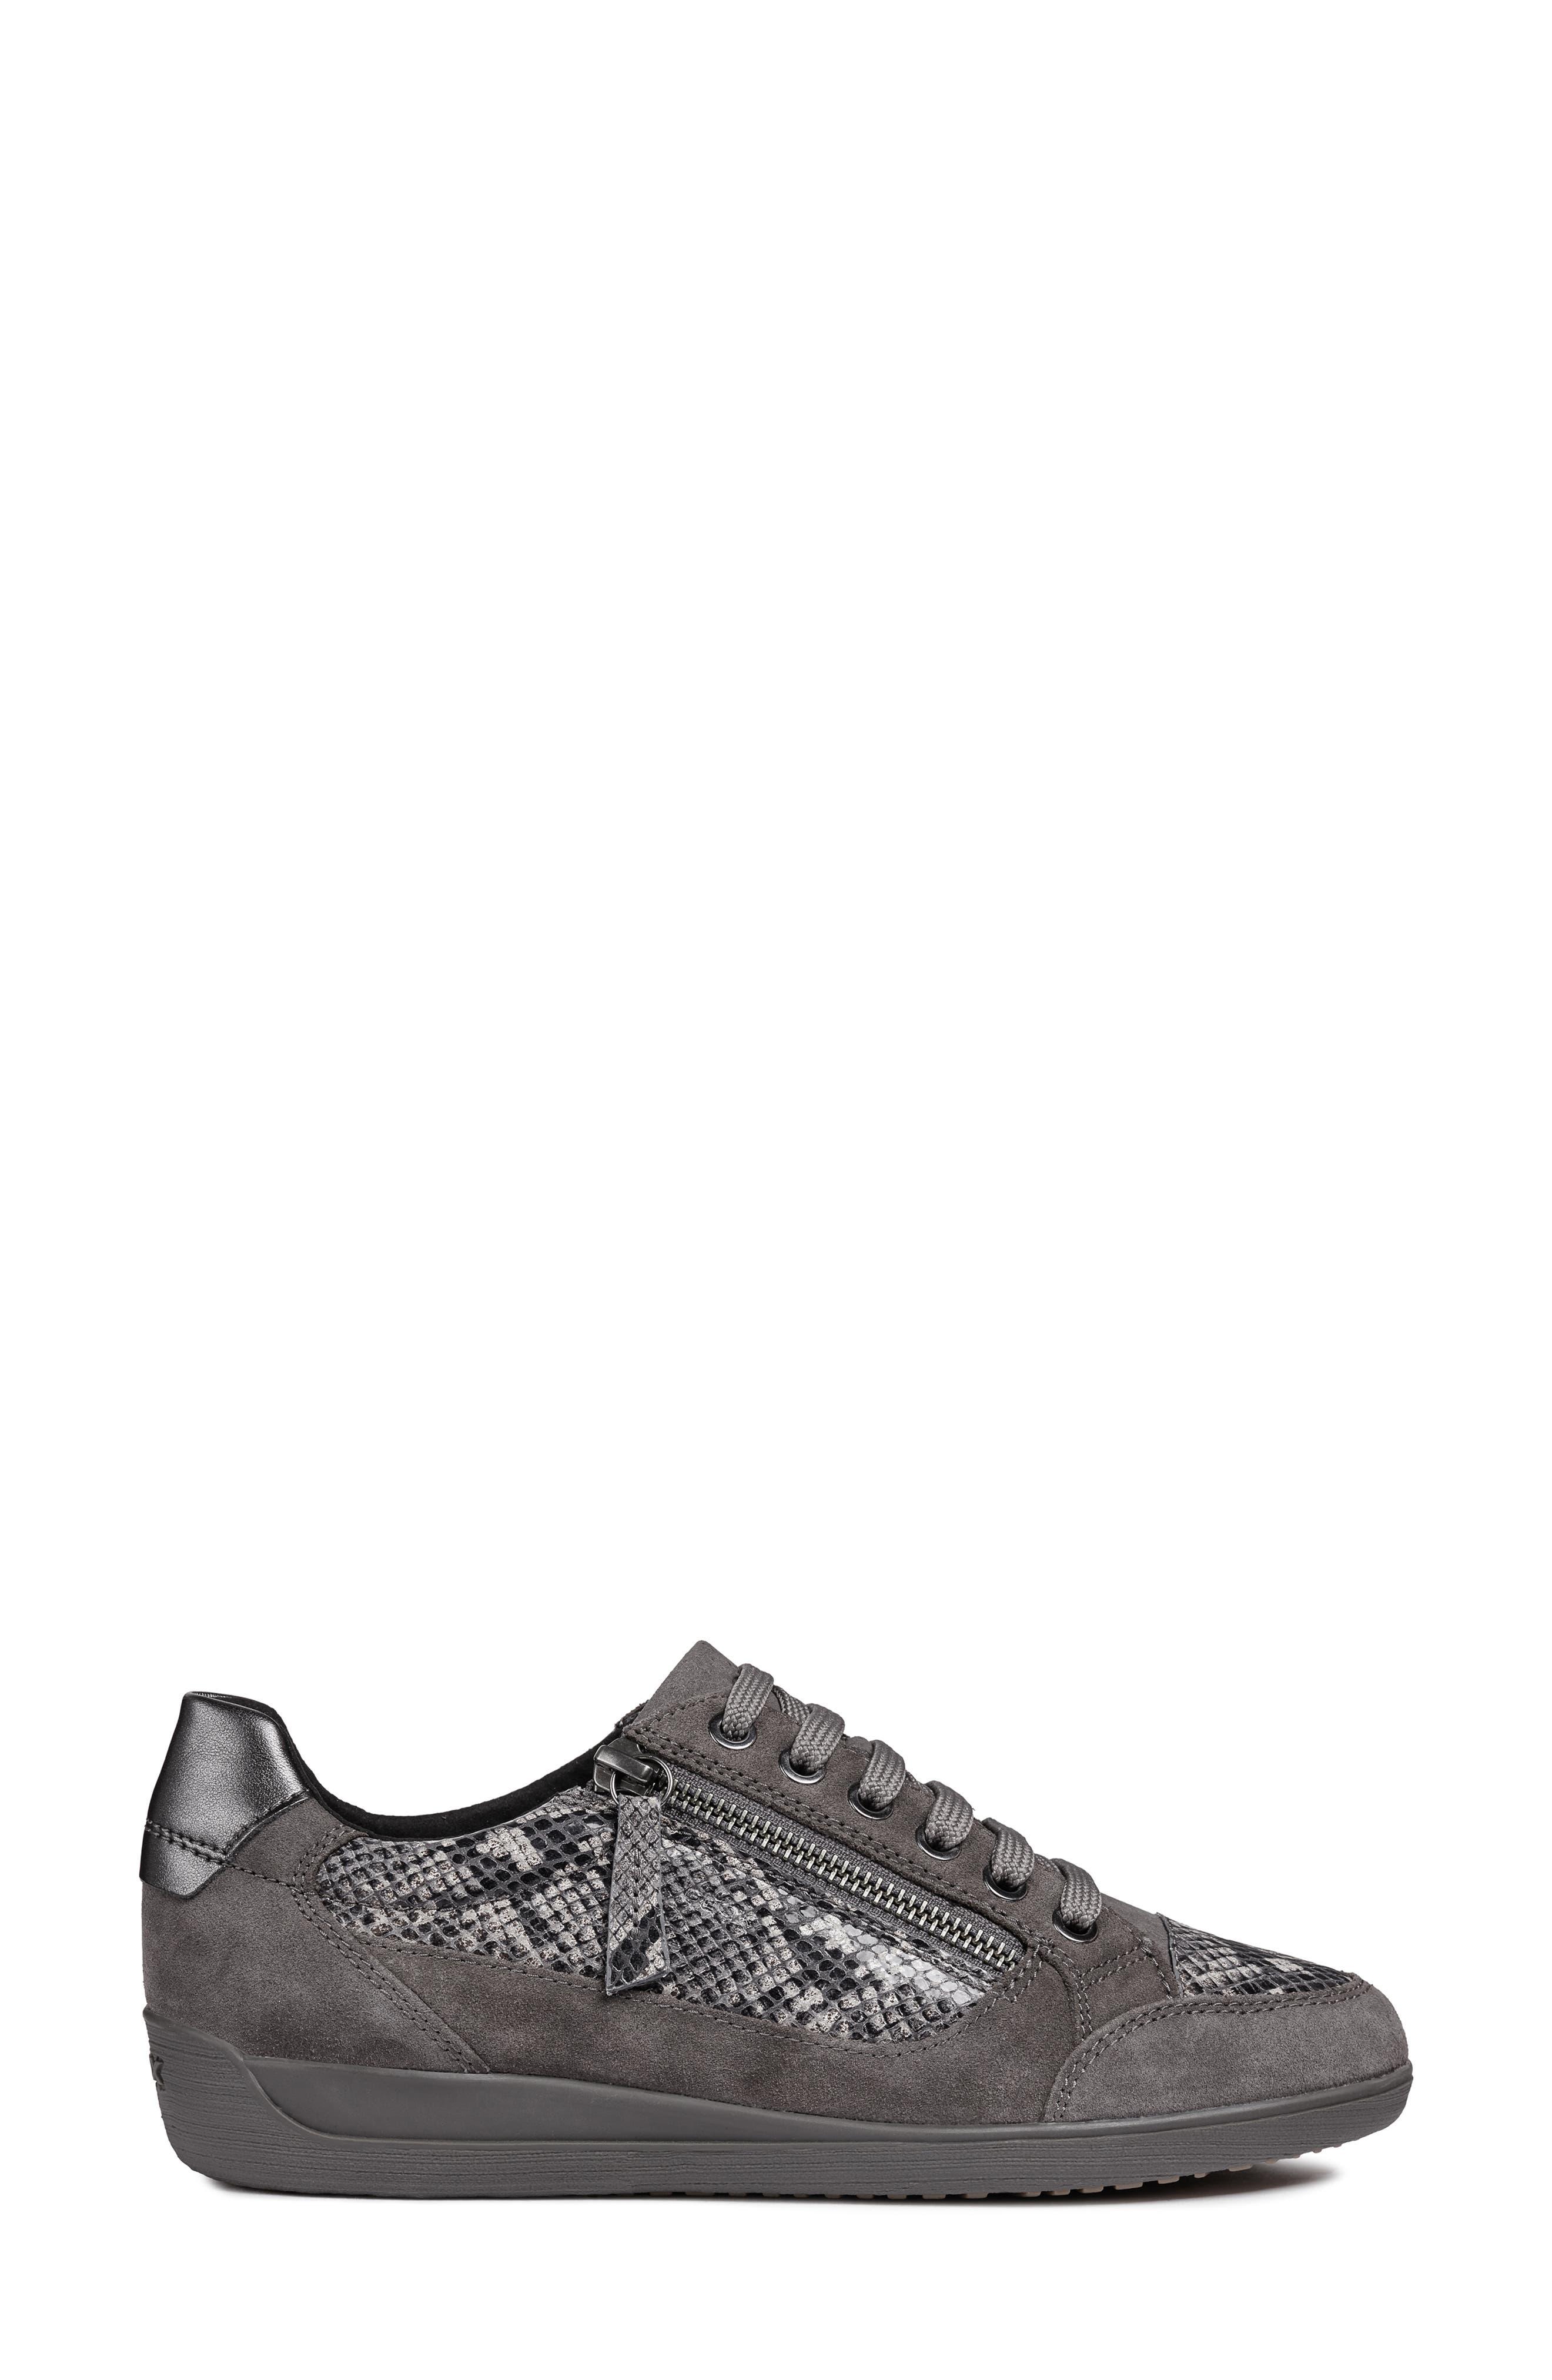 Myria Sneaker,                             Alternate thumbnail 3, color,                             DARK GREY SUEDE